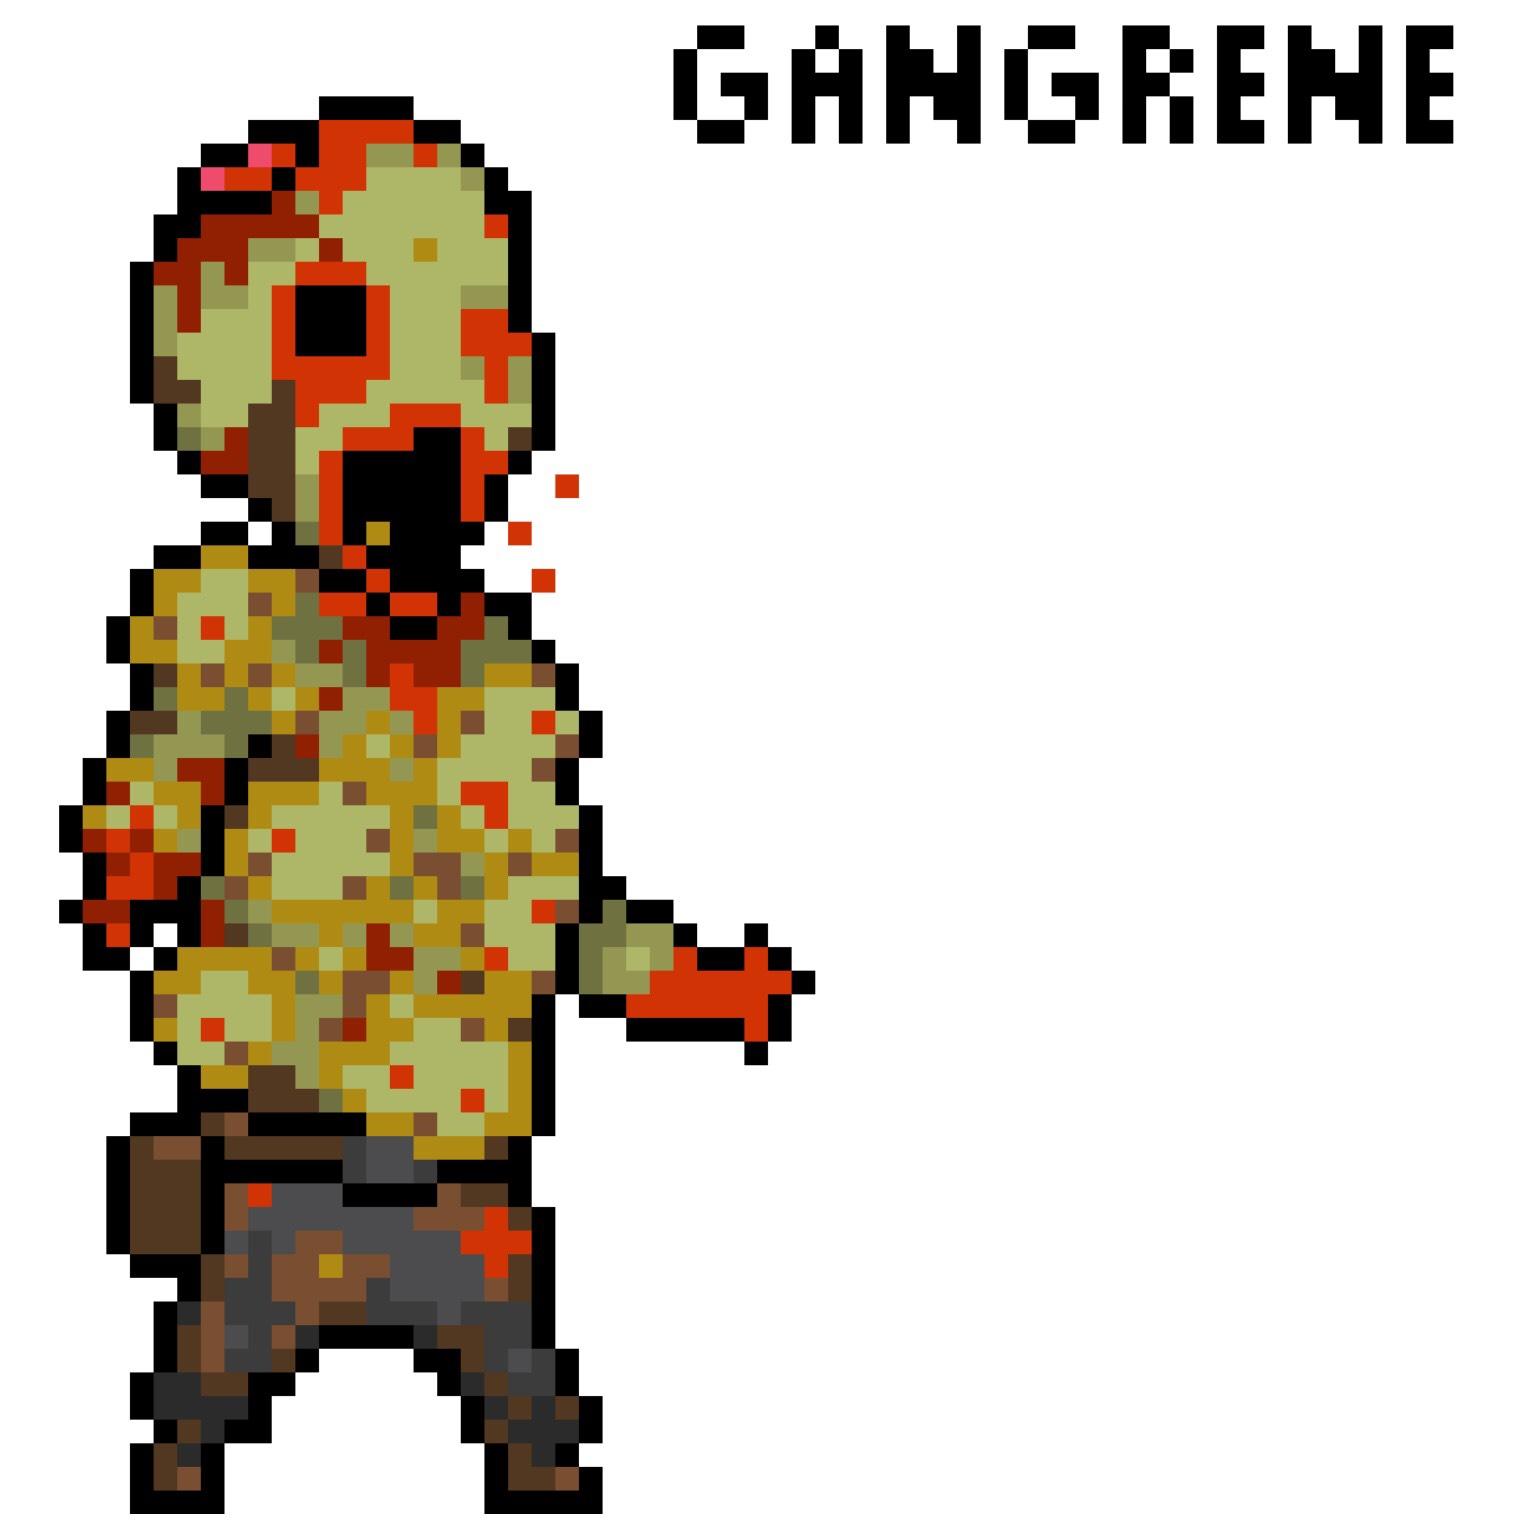 Zombie idea: Gangrene.